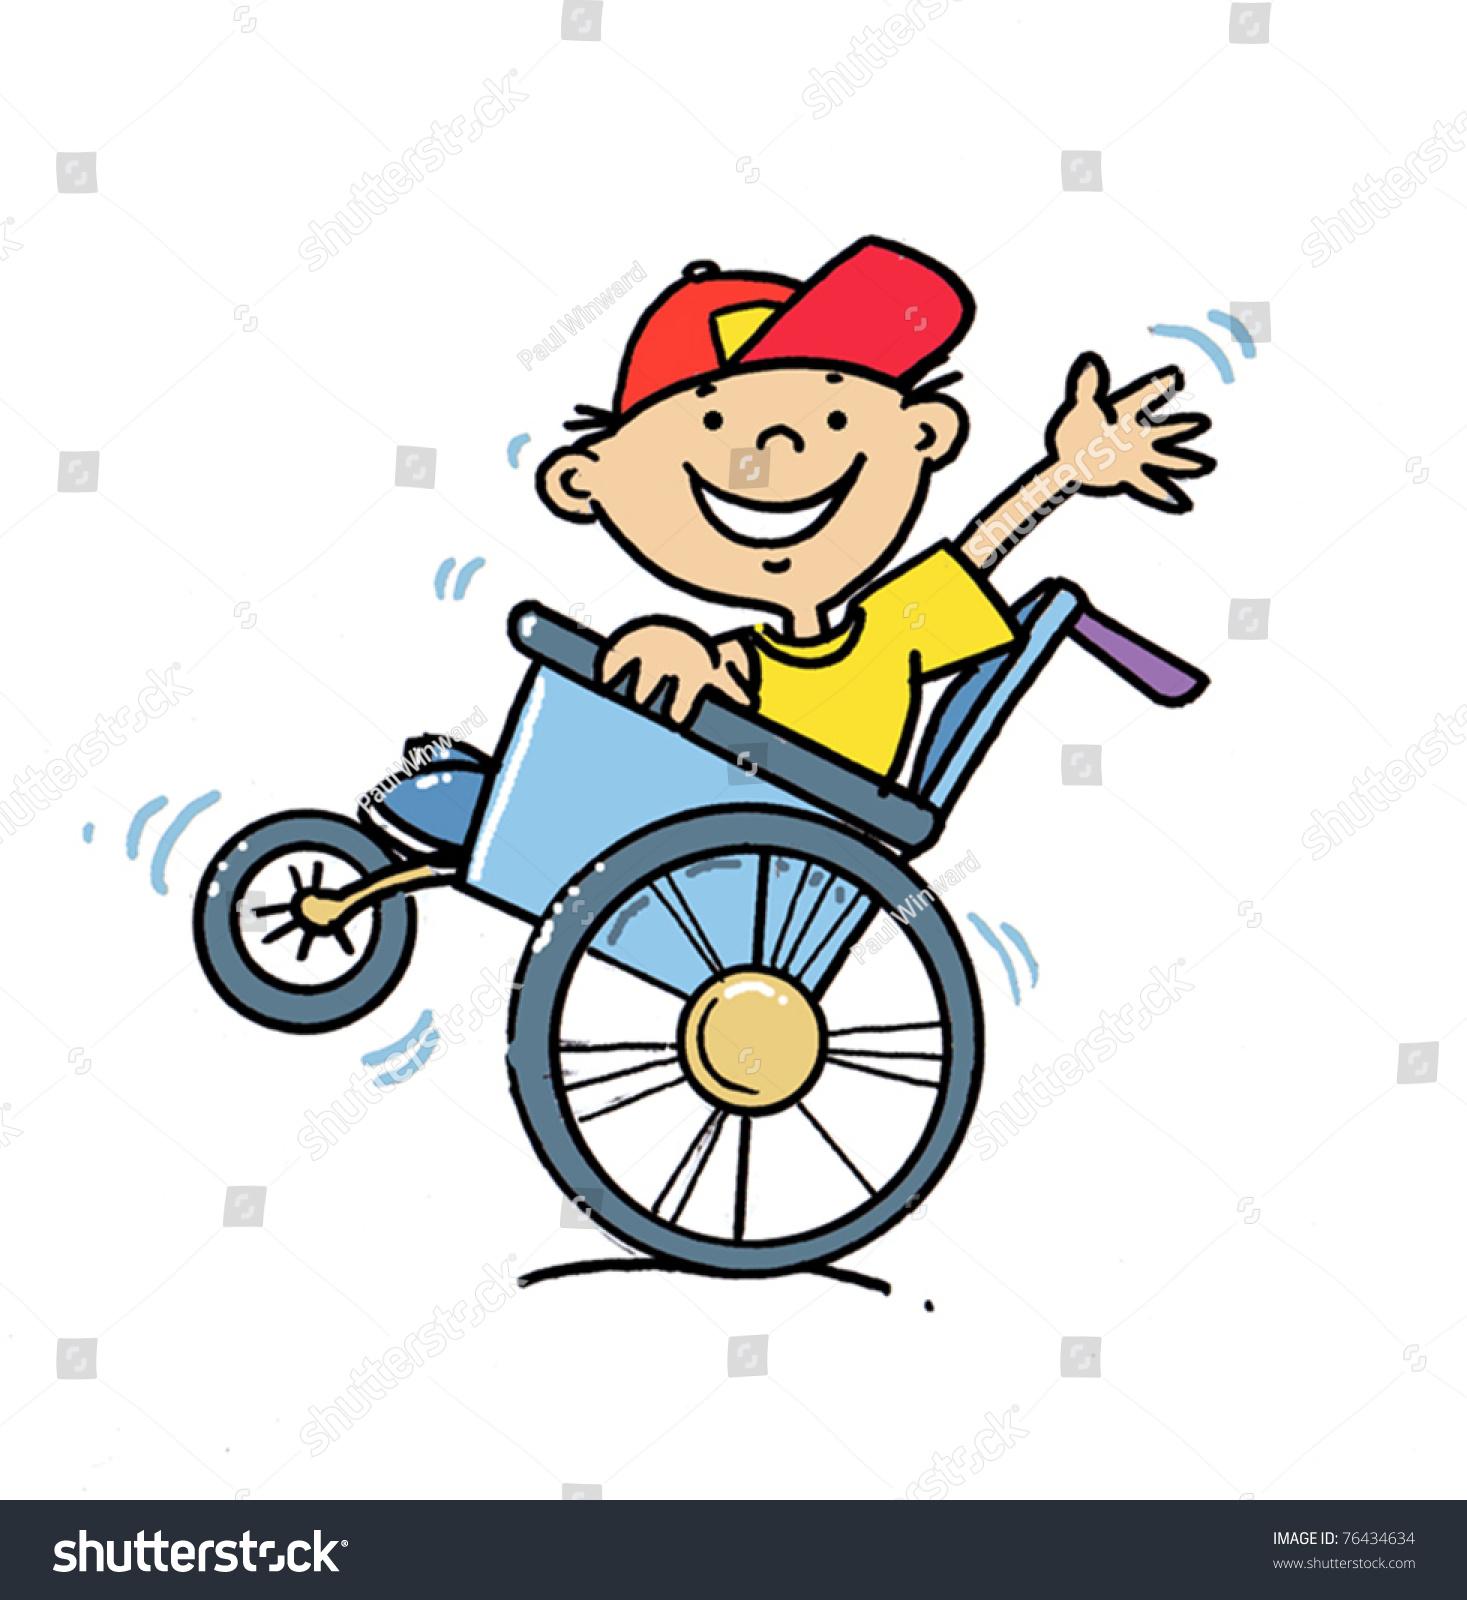 Boy In A Wheelchair Stock Vector Illustration 76434634.